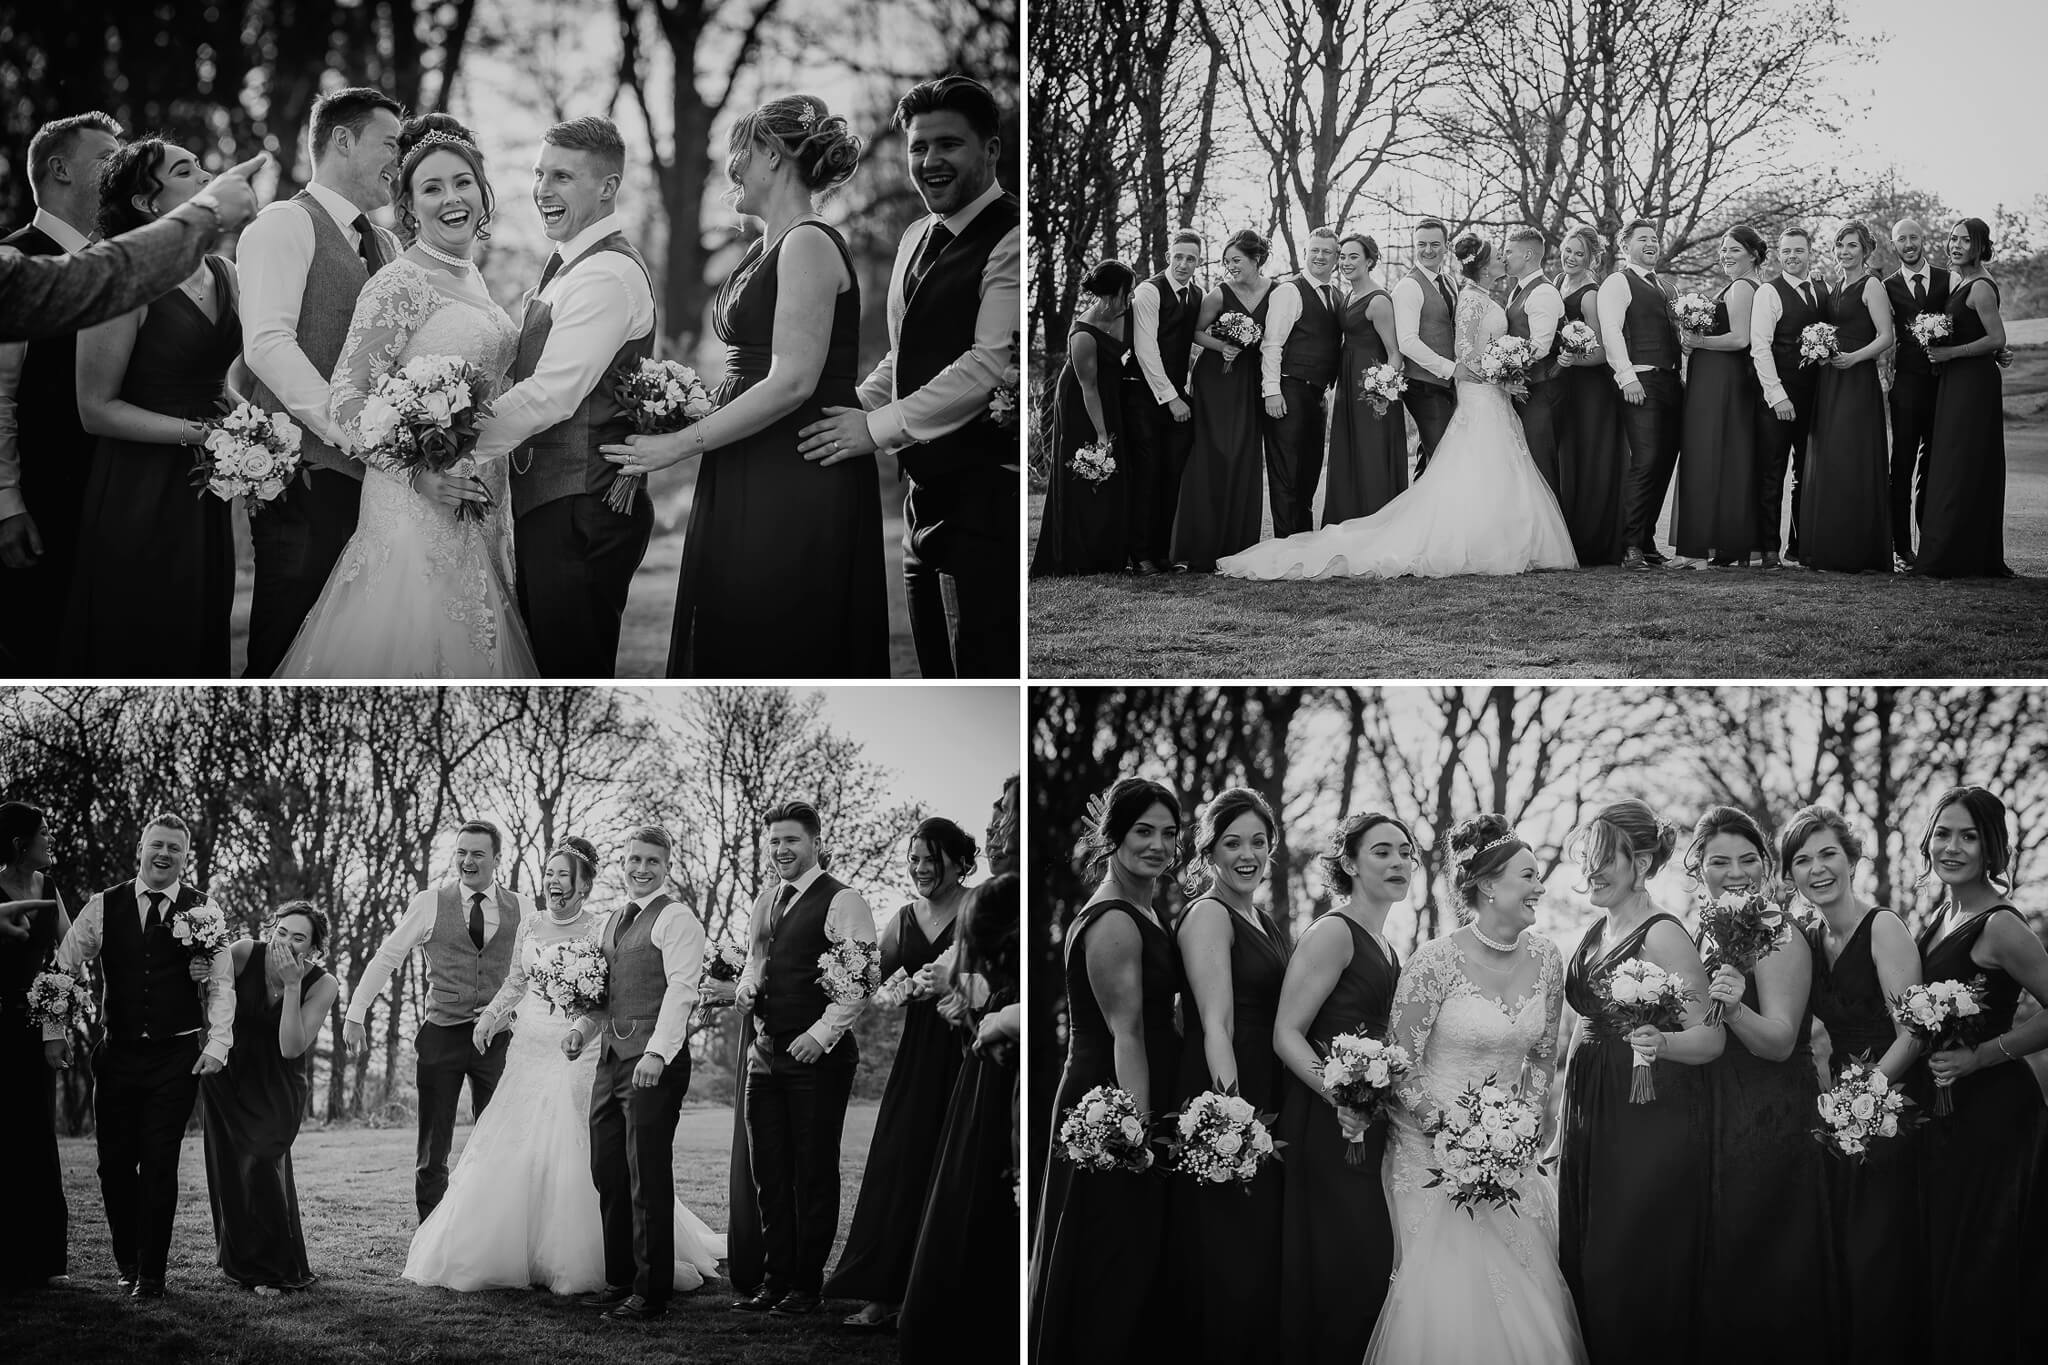 wigan-bridesmaids-groomsmen-stanbury-wedding-photography